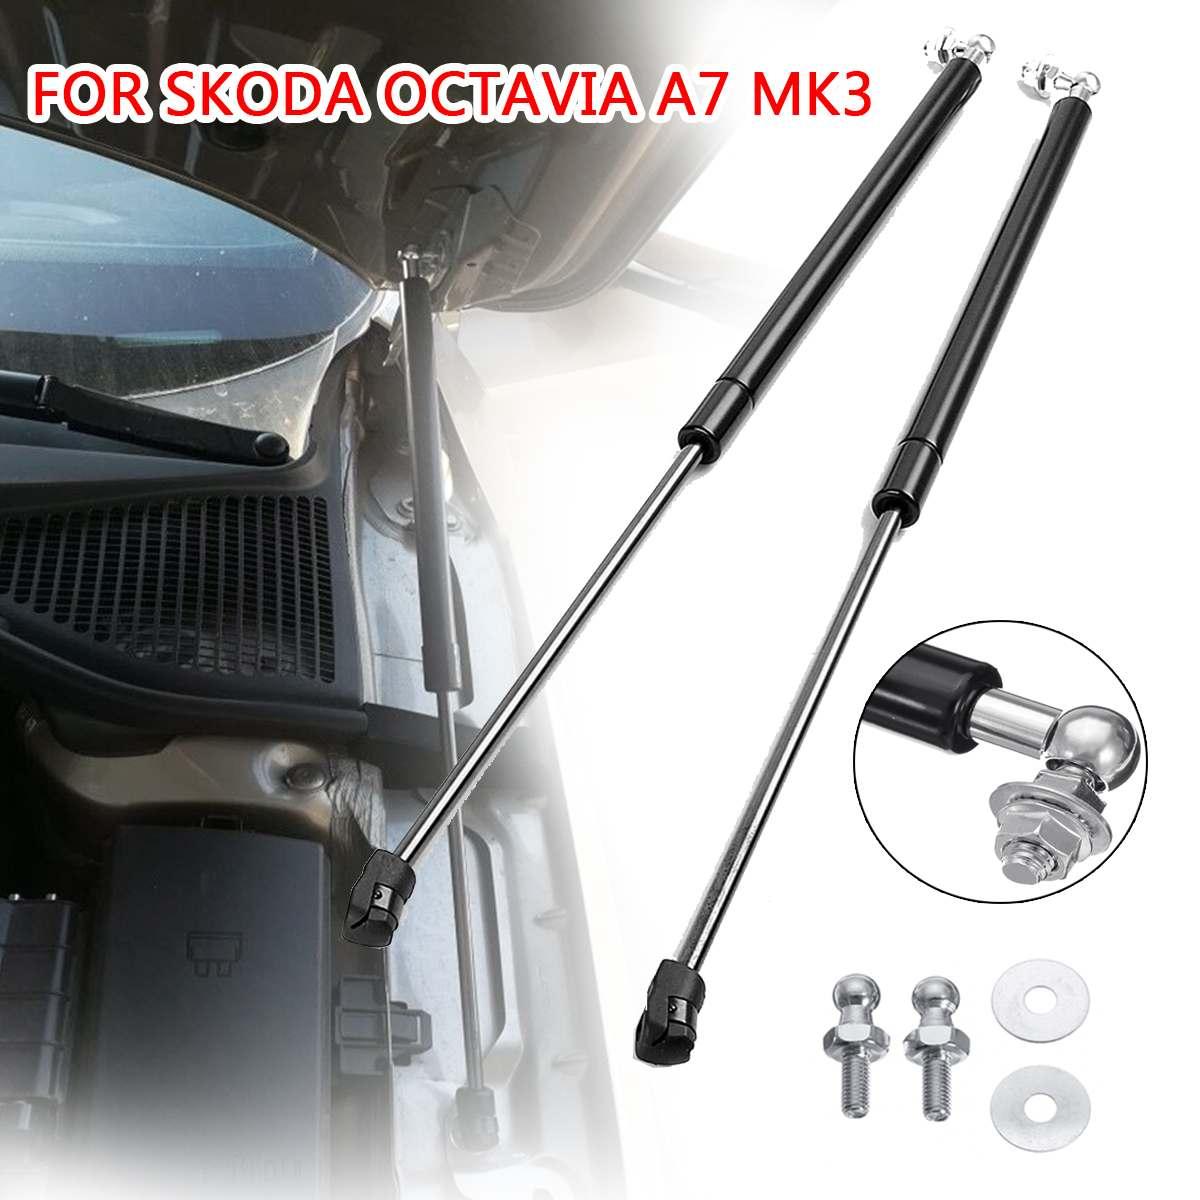 2Pcs Auto Hinten Gas Schock Hood Shock Strut Dämpfer Lift Unterstützung Für Skoda Octavia A7 MK3